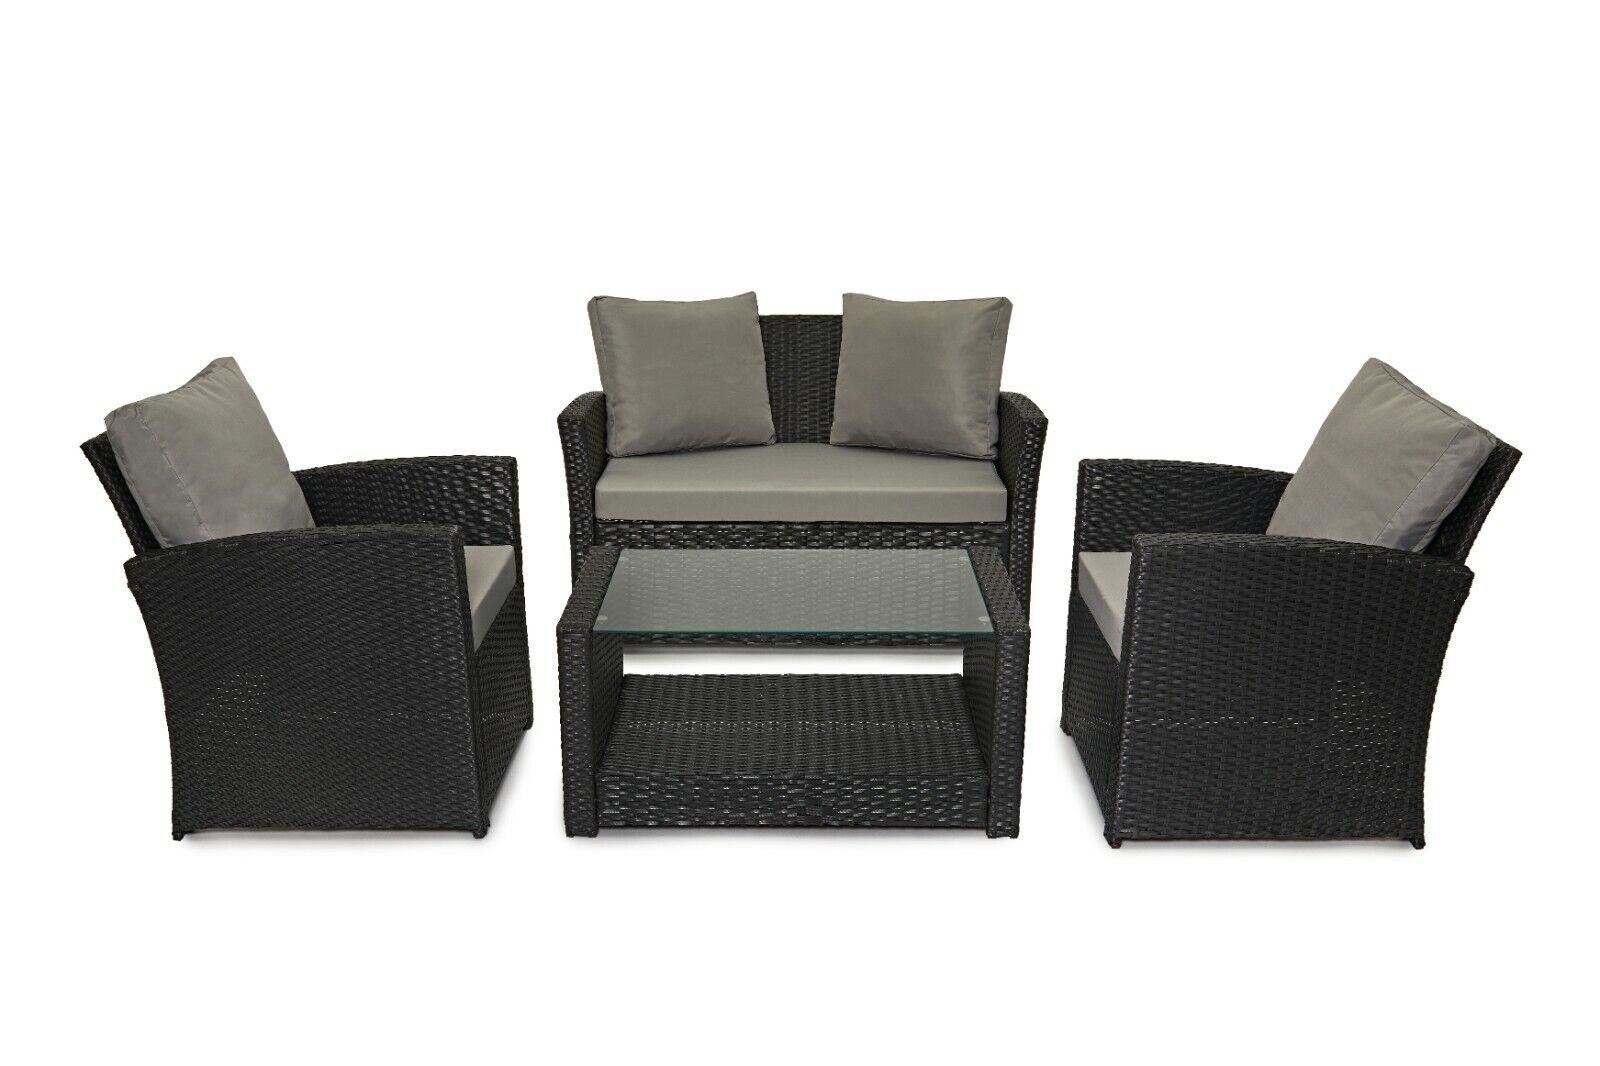 Garden Furniture - Evre Rattan 4 Piece Patio Furniture Set Outdoor Conservatory Garden Set Roma